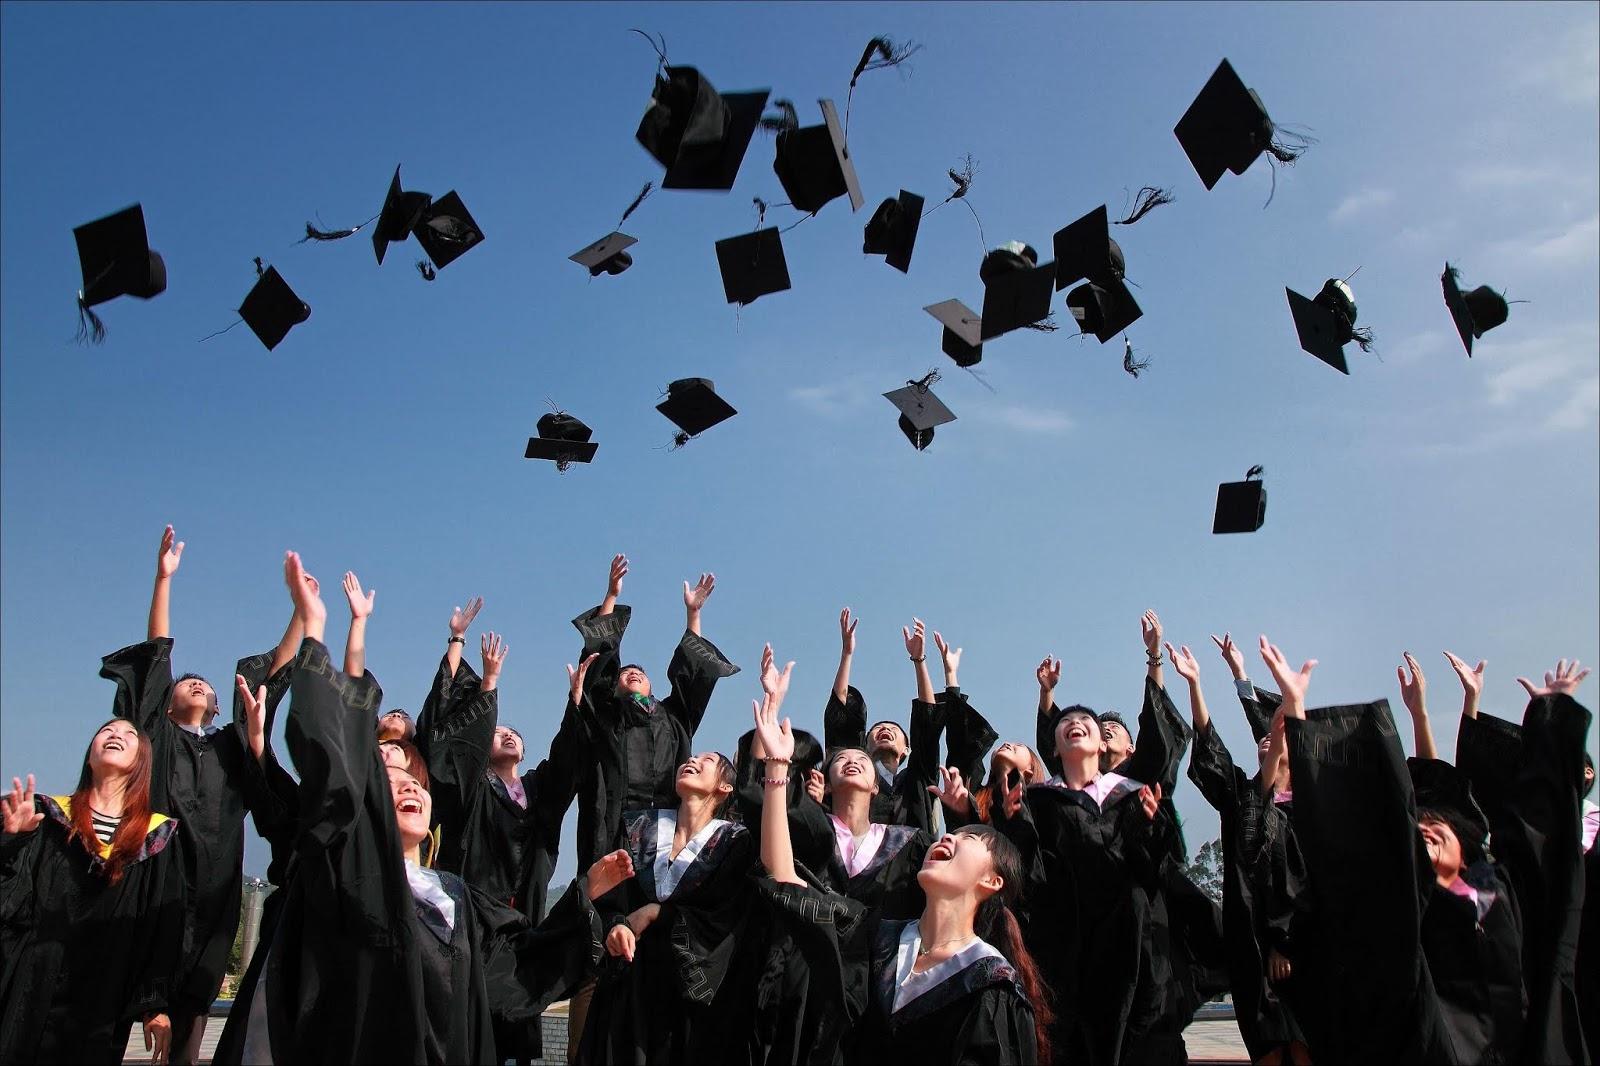 Senior Picture Captions For Graduation Ceremony